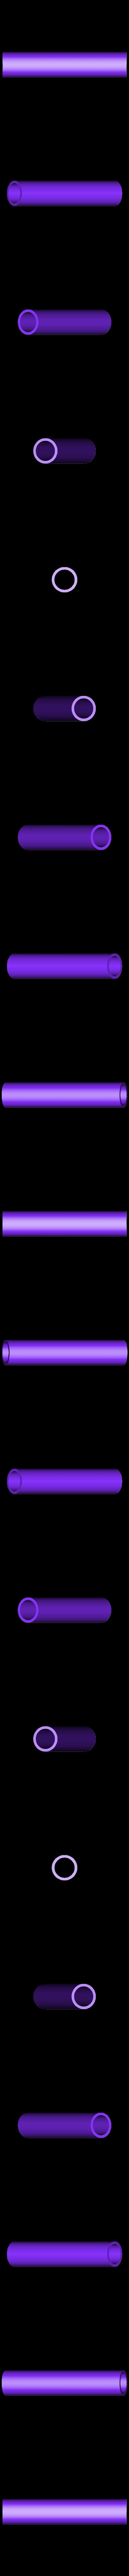 shaft-small1.stl Download free STL file FPV kit for Turnigy 9XR • 3D print model, 3dxl